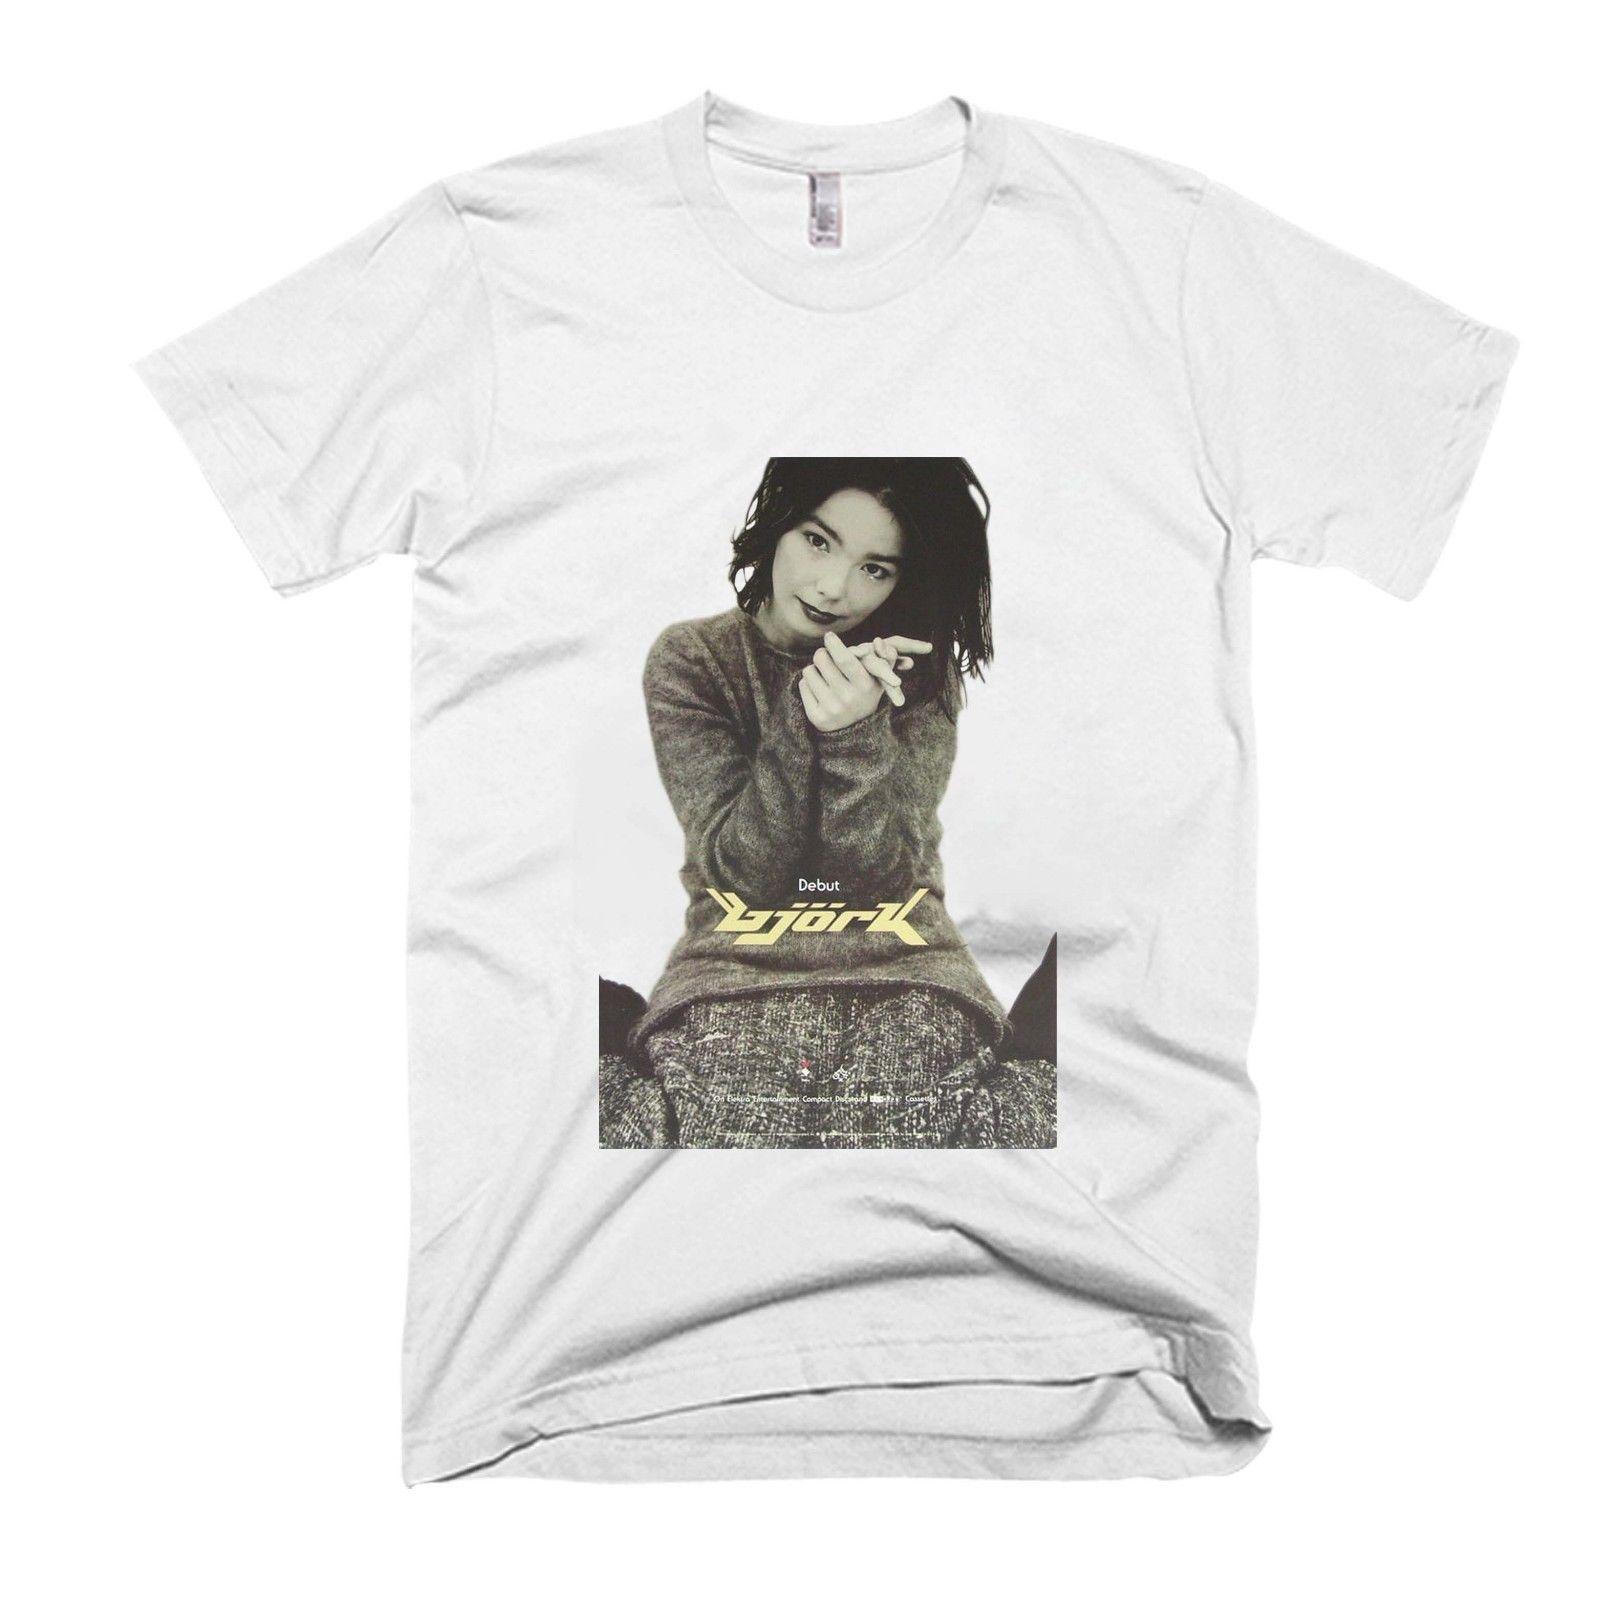 Bjork Pose Cute Men s / Women s T Shirt free shipping tee Chinese Style  Summer Short Sleeve Casual Hot Cheap Short Sleeve Male